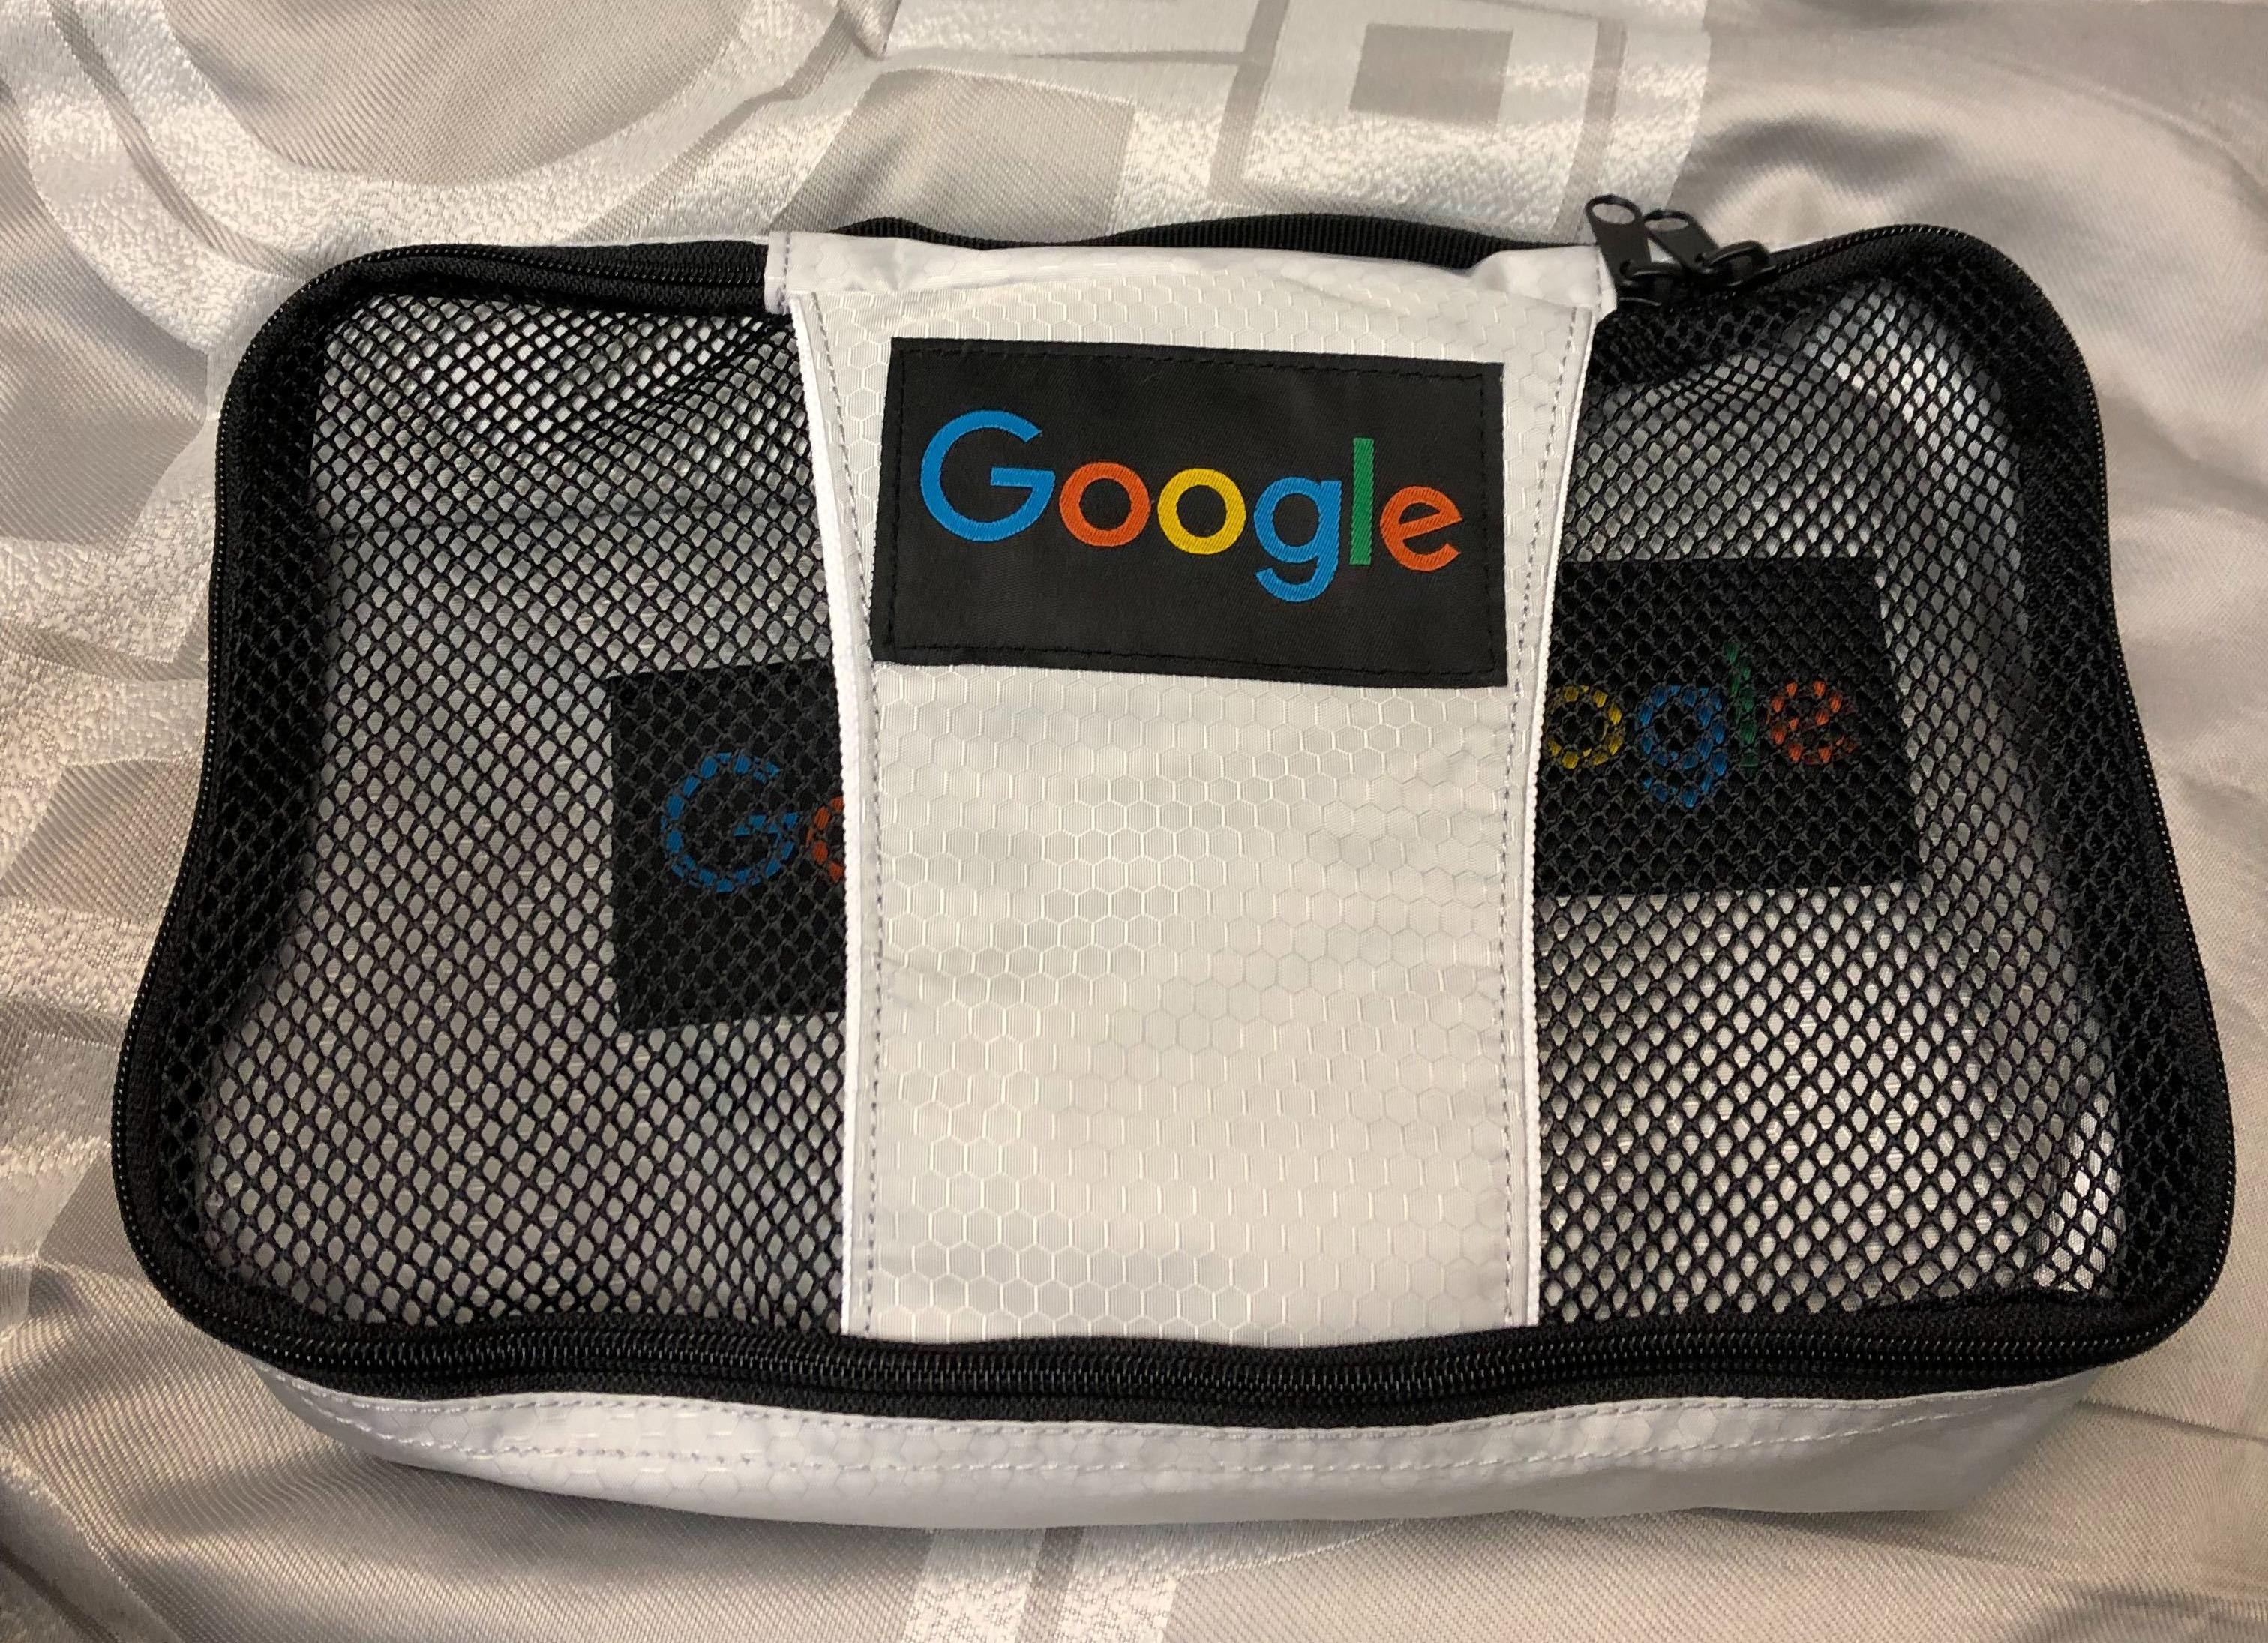 google_bag.jpg